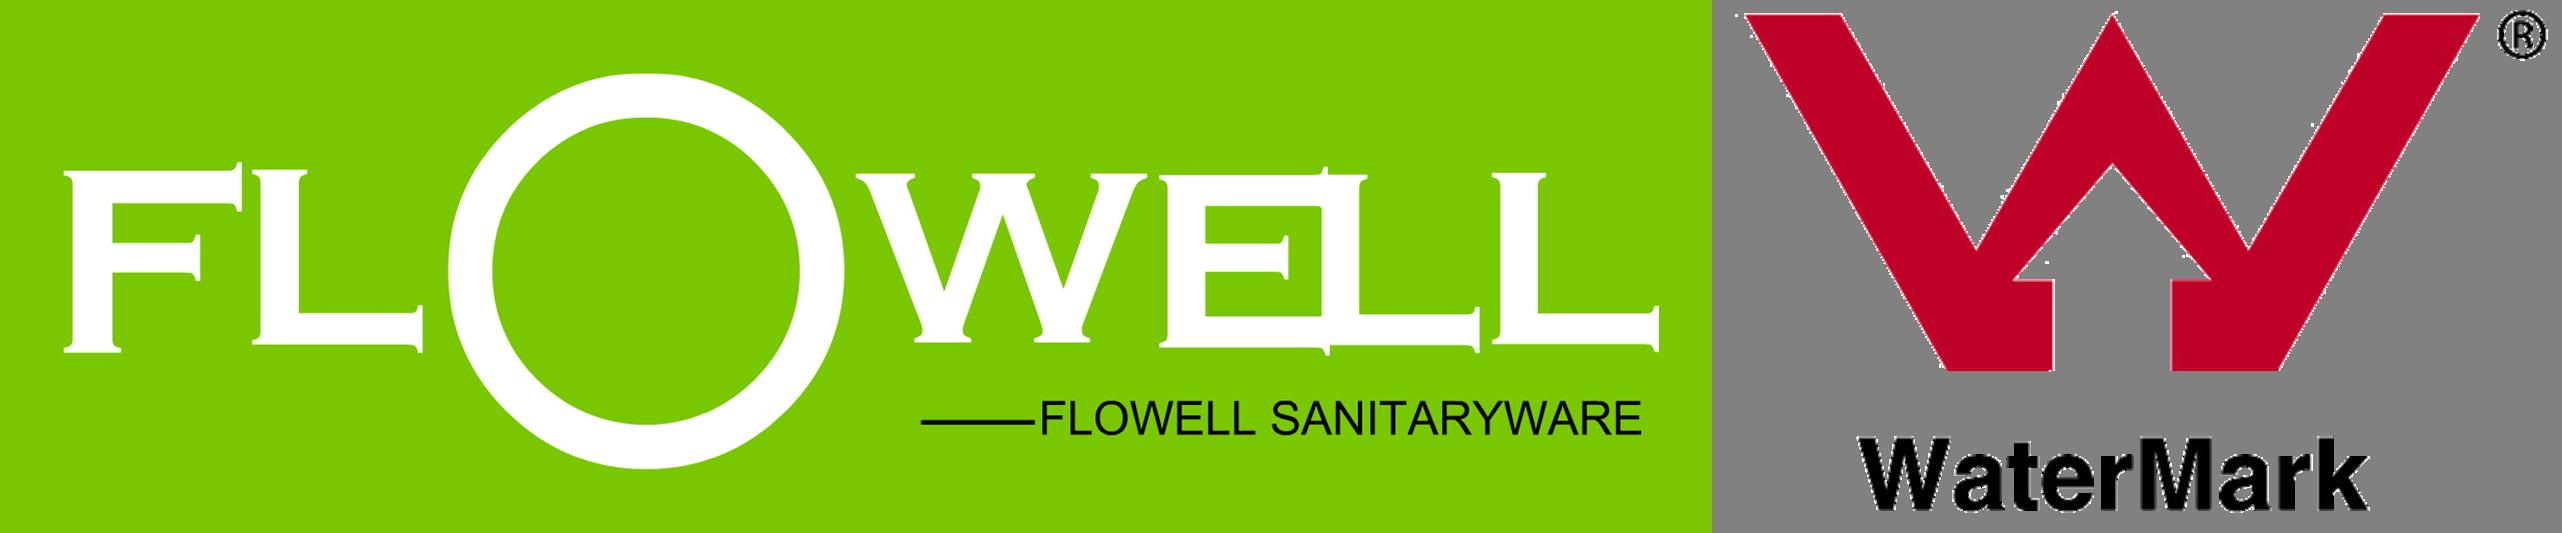 Flo Well Budget Tapware